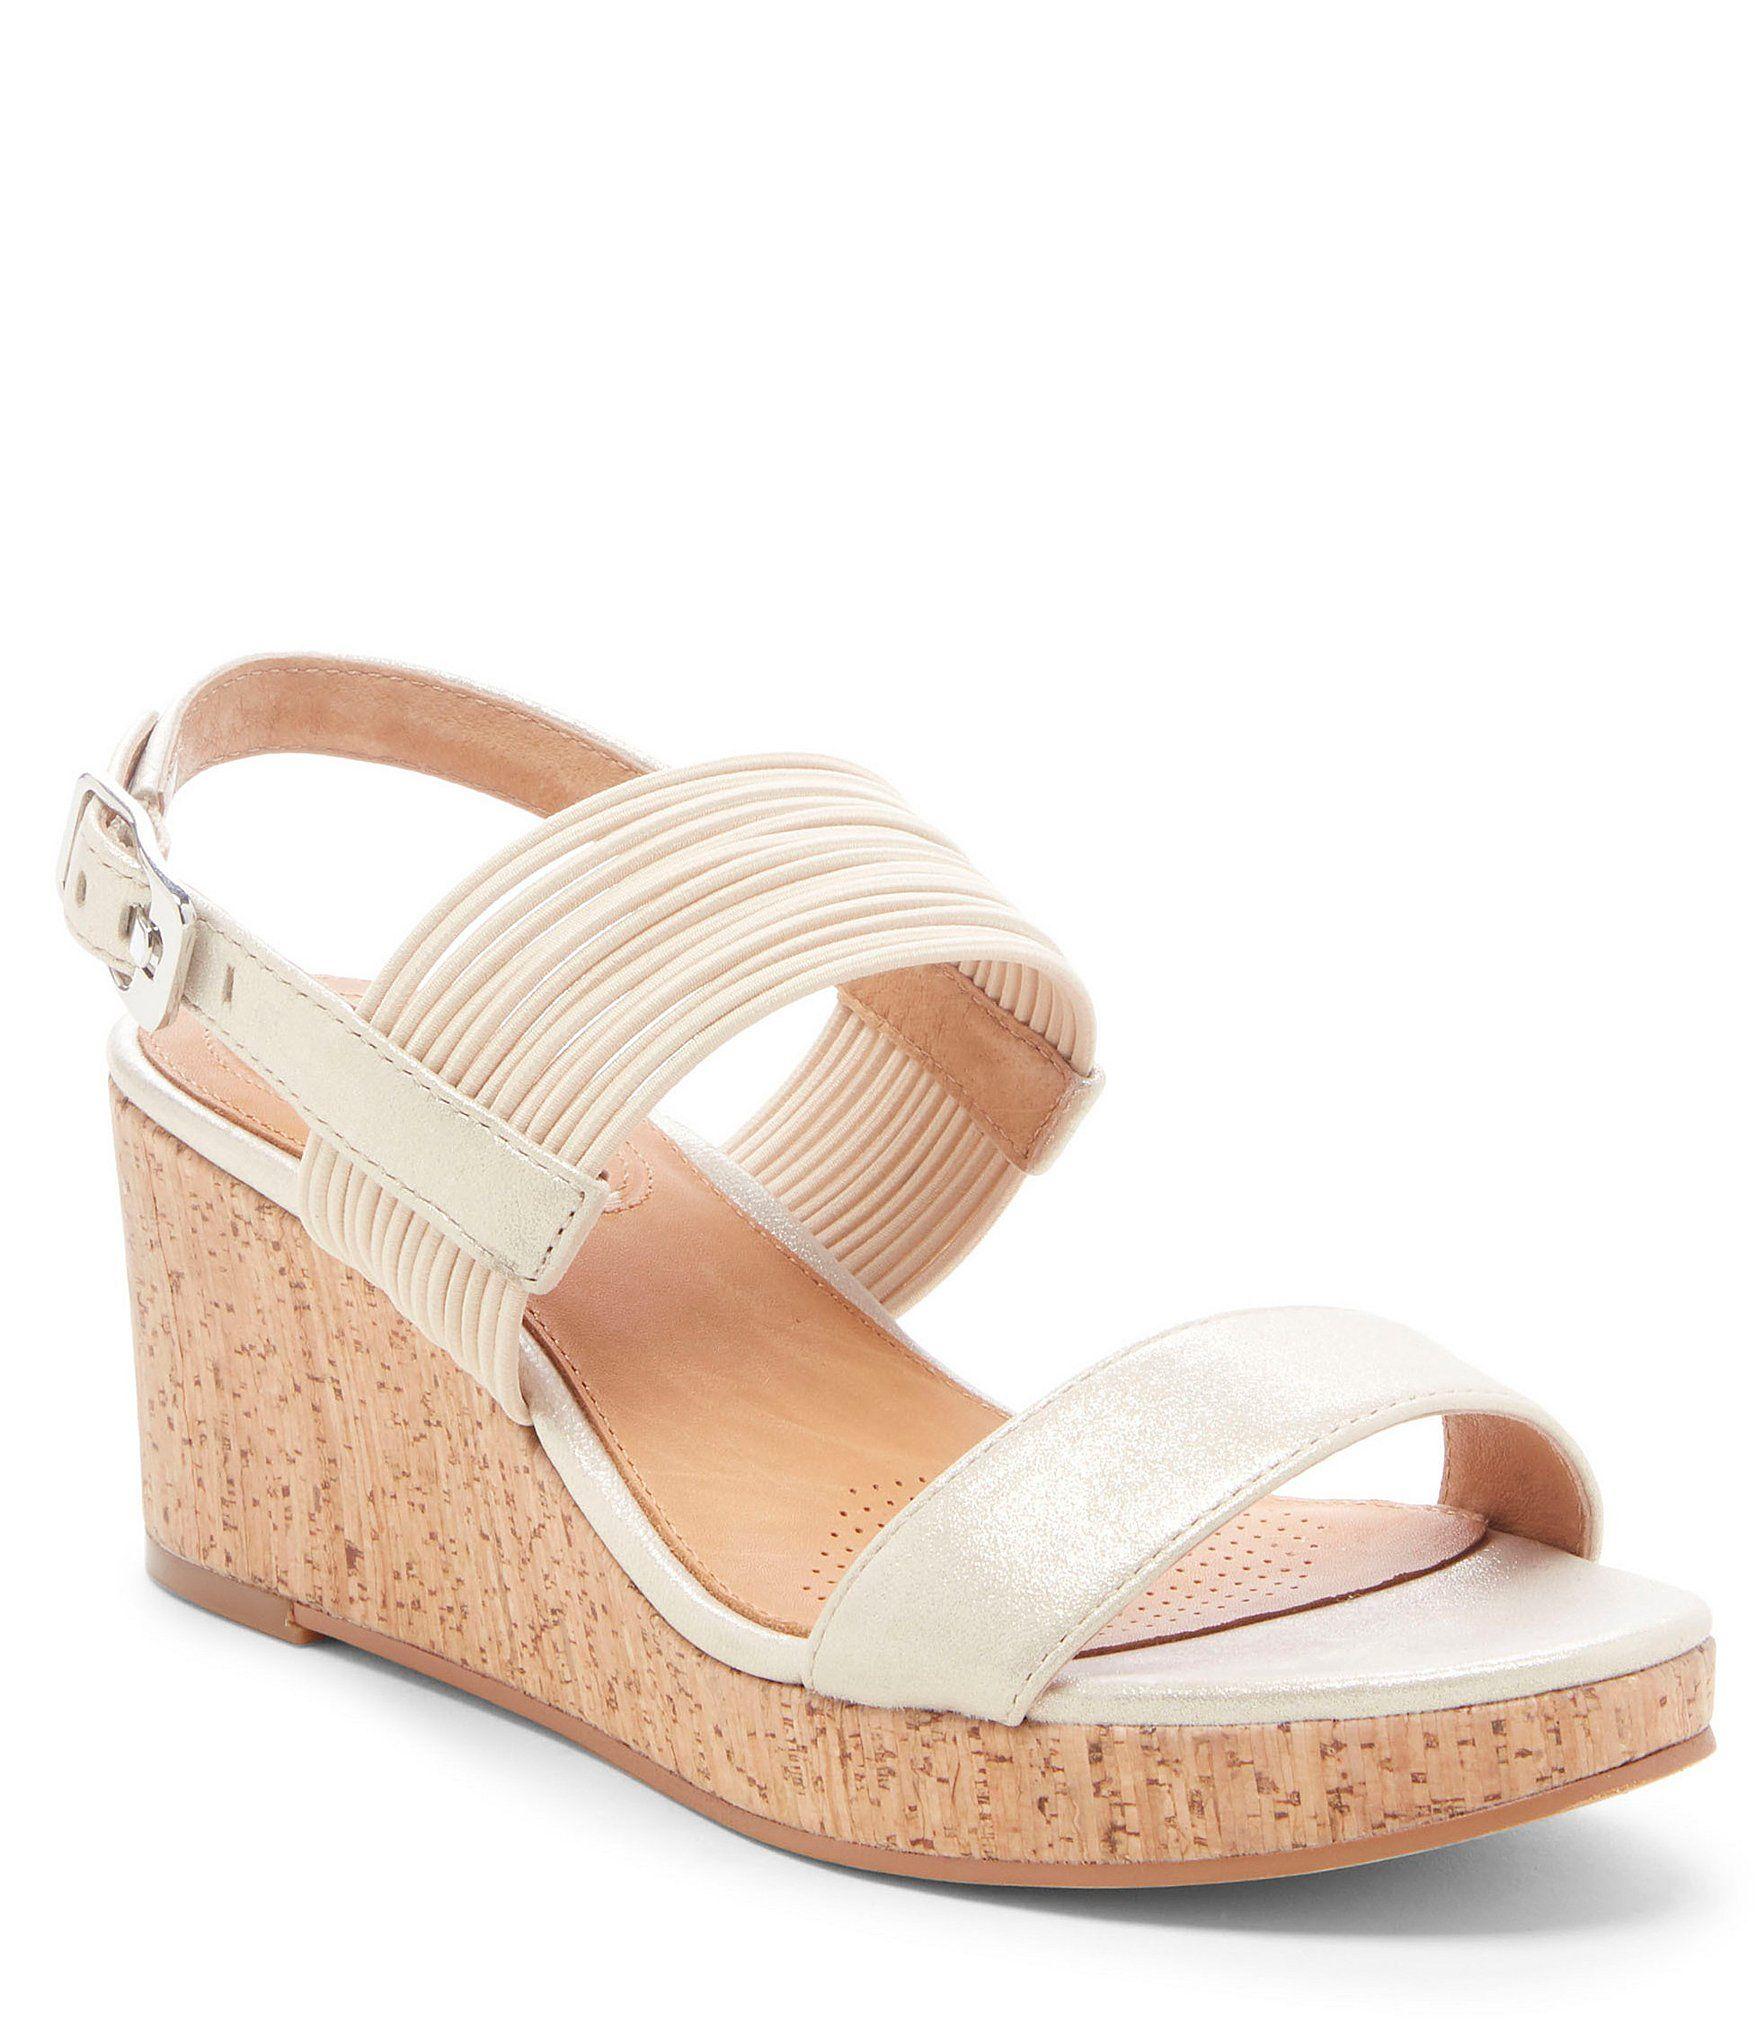 19ba9e1c5 CC Corso Como Fantazie Leather & Cork Wedge Sandals #Dillards ...